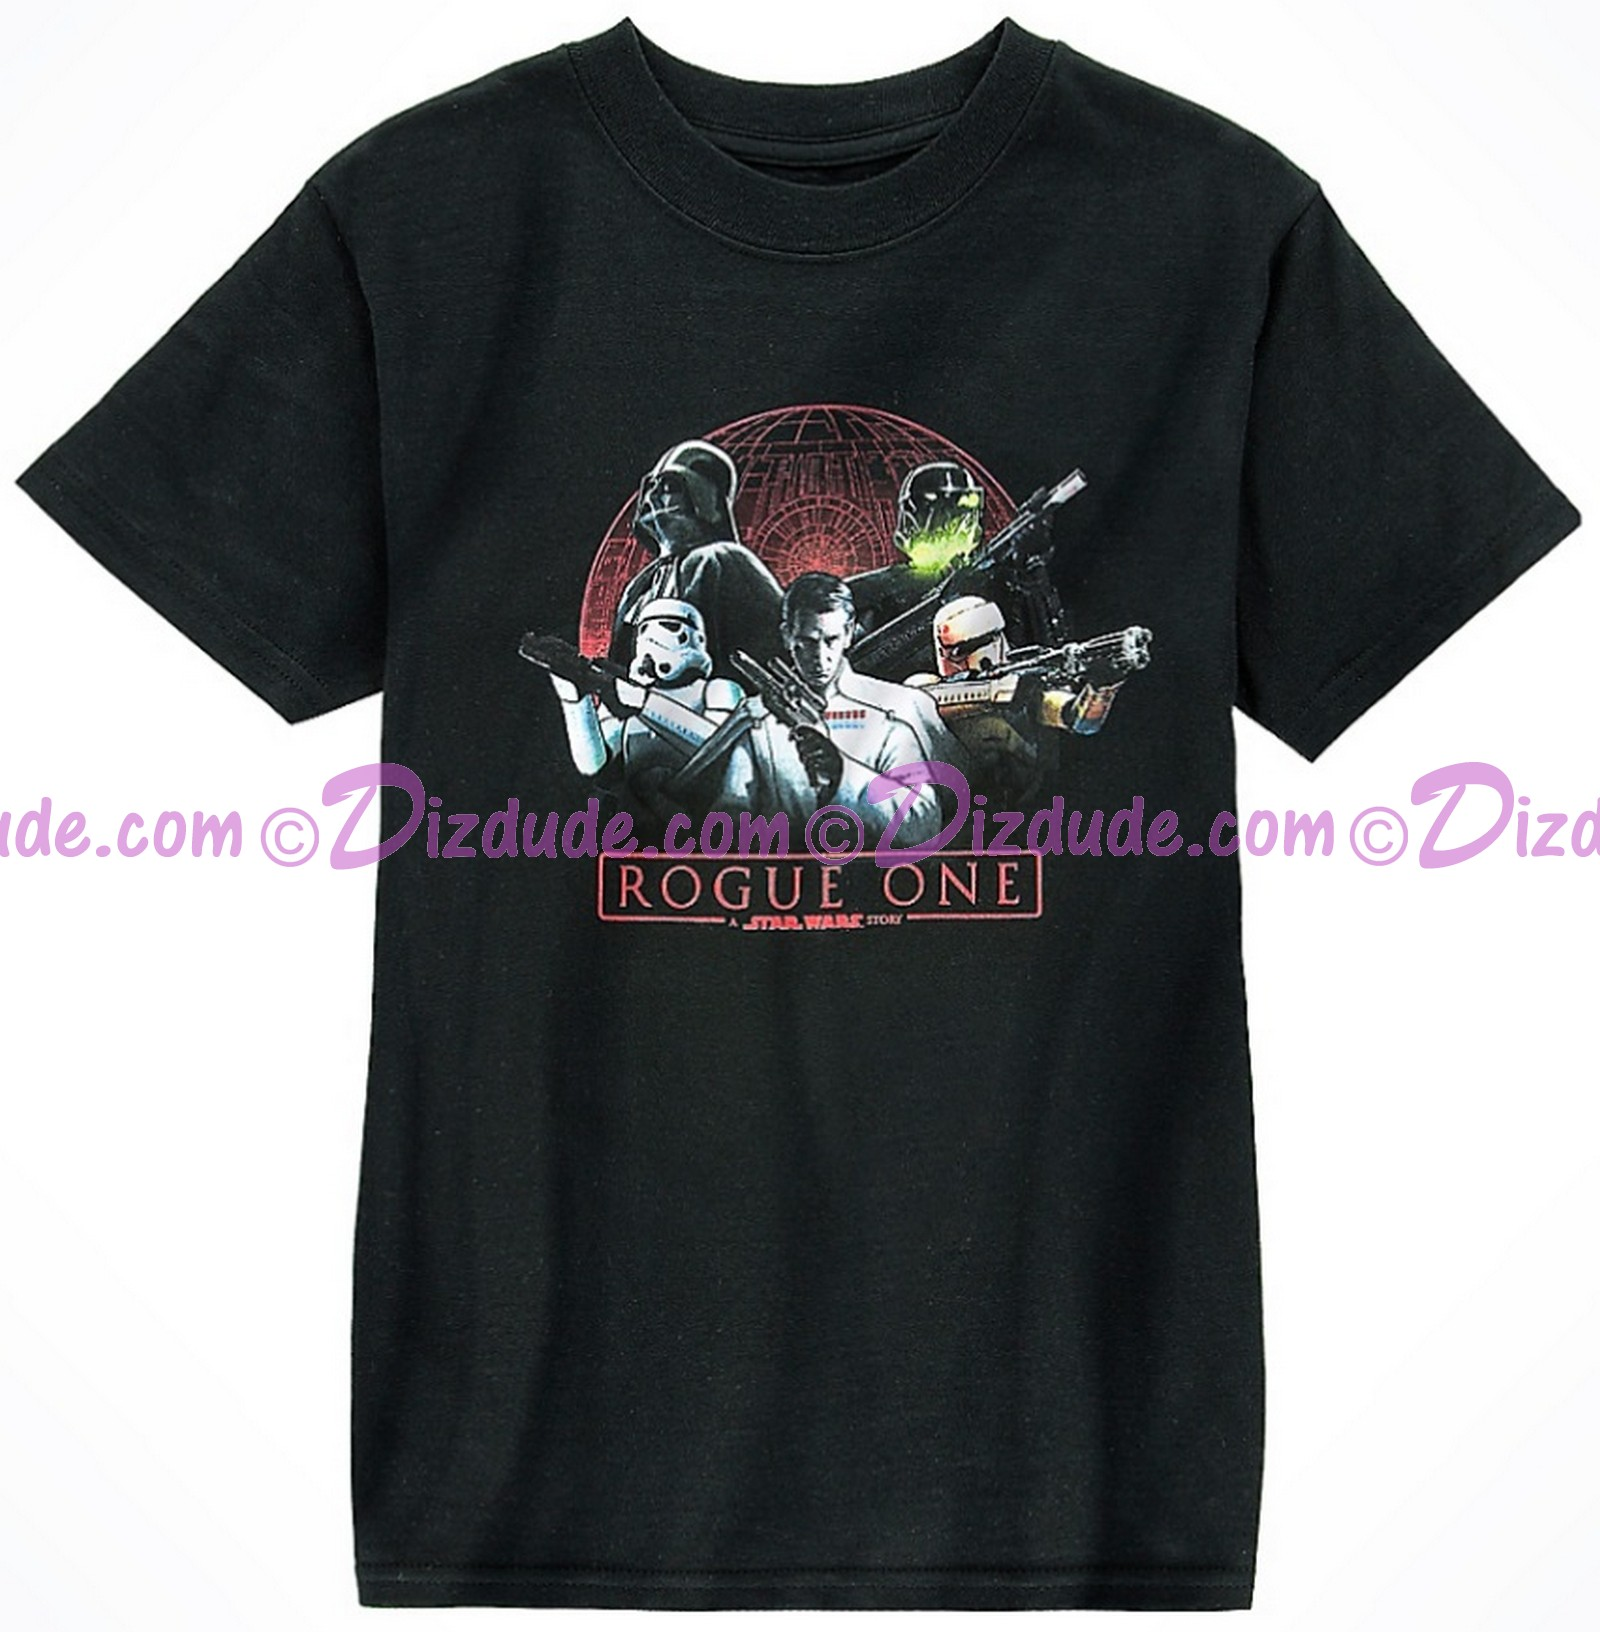 Rogue One Empire Youth T-Shirt (Tshirt, T shirt or Tee) - Disney's Star Wars © Dizdude.com